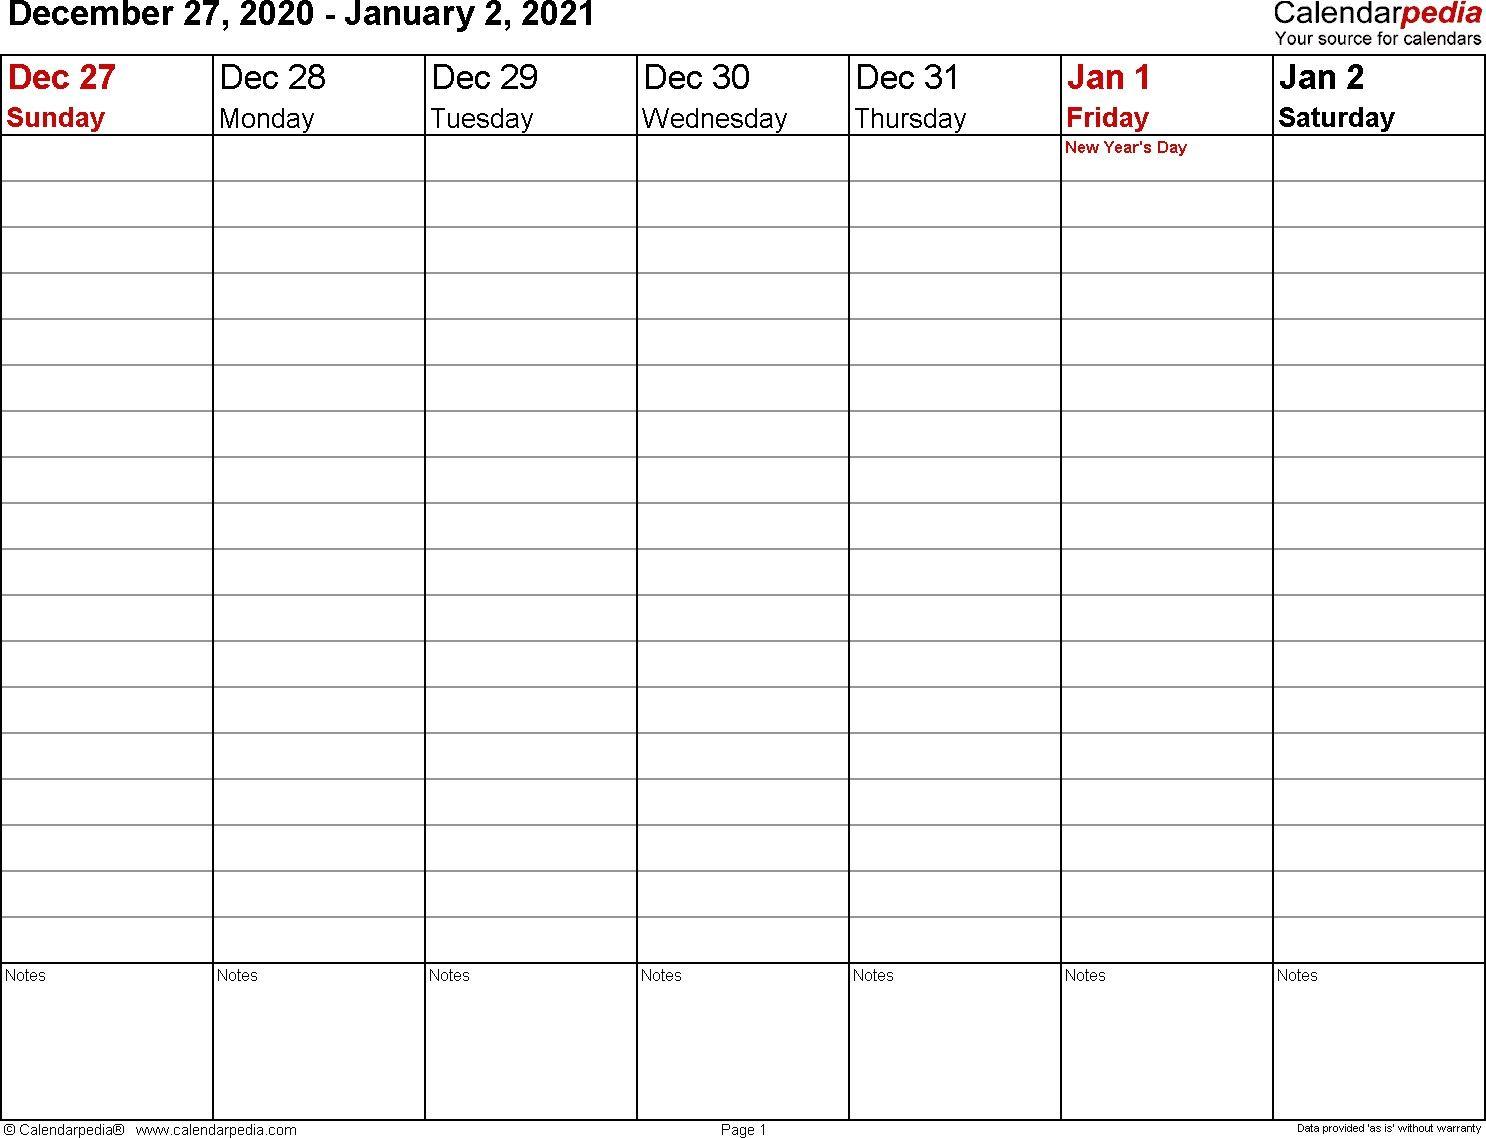 Calendarpedia Free Download Printable Calendar Templates